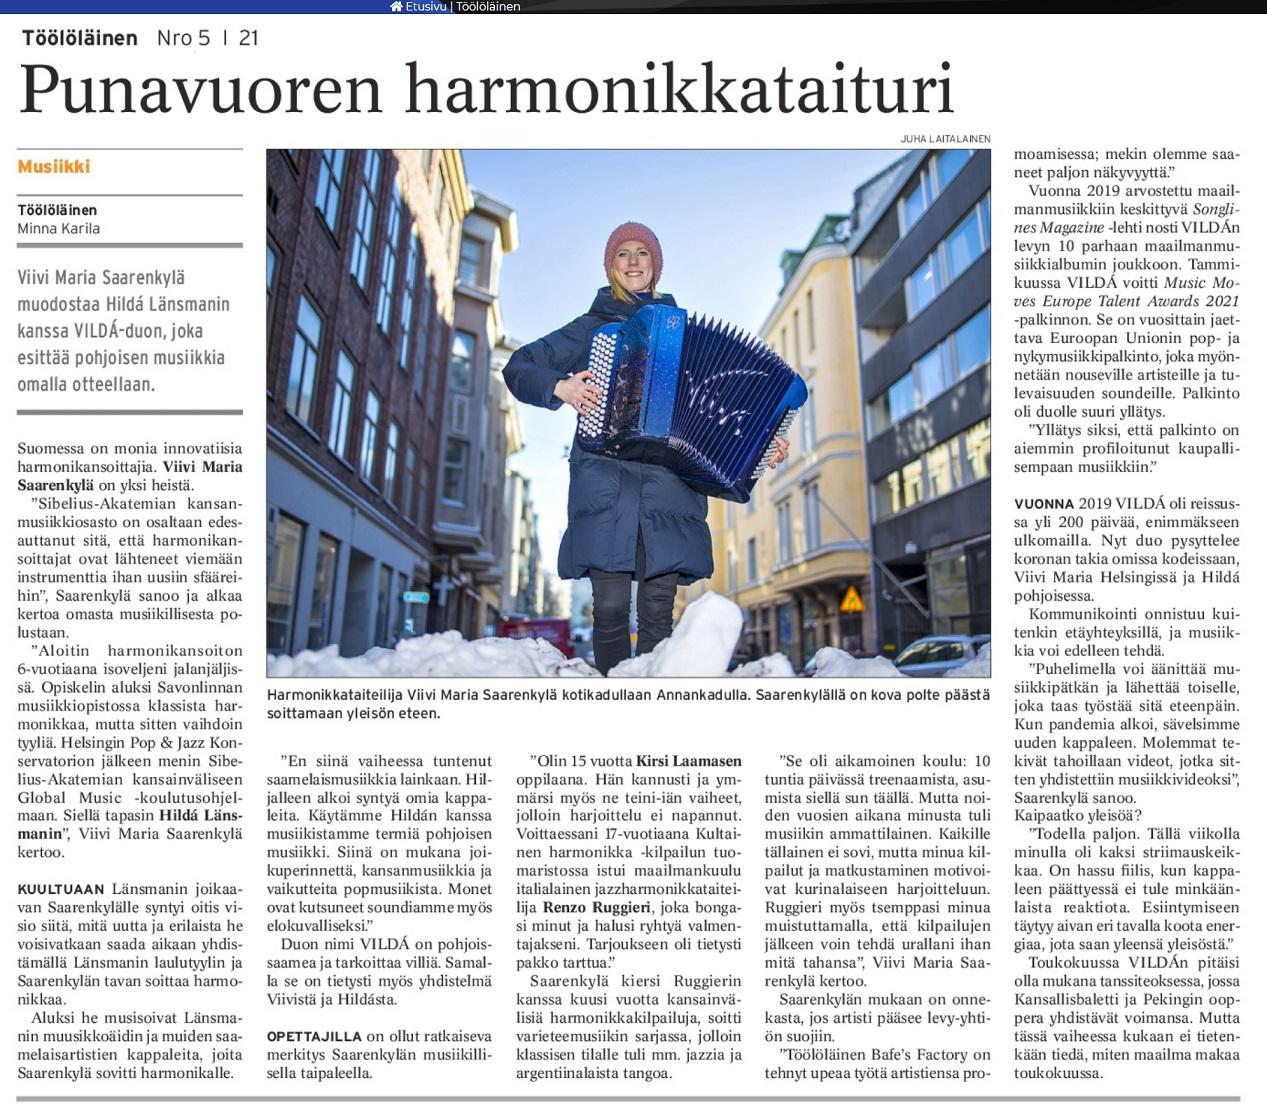 Töölöläinen (Finland), N:o 5, 7.3.2021